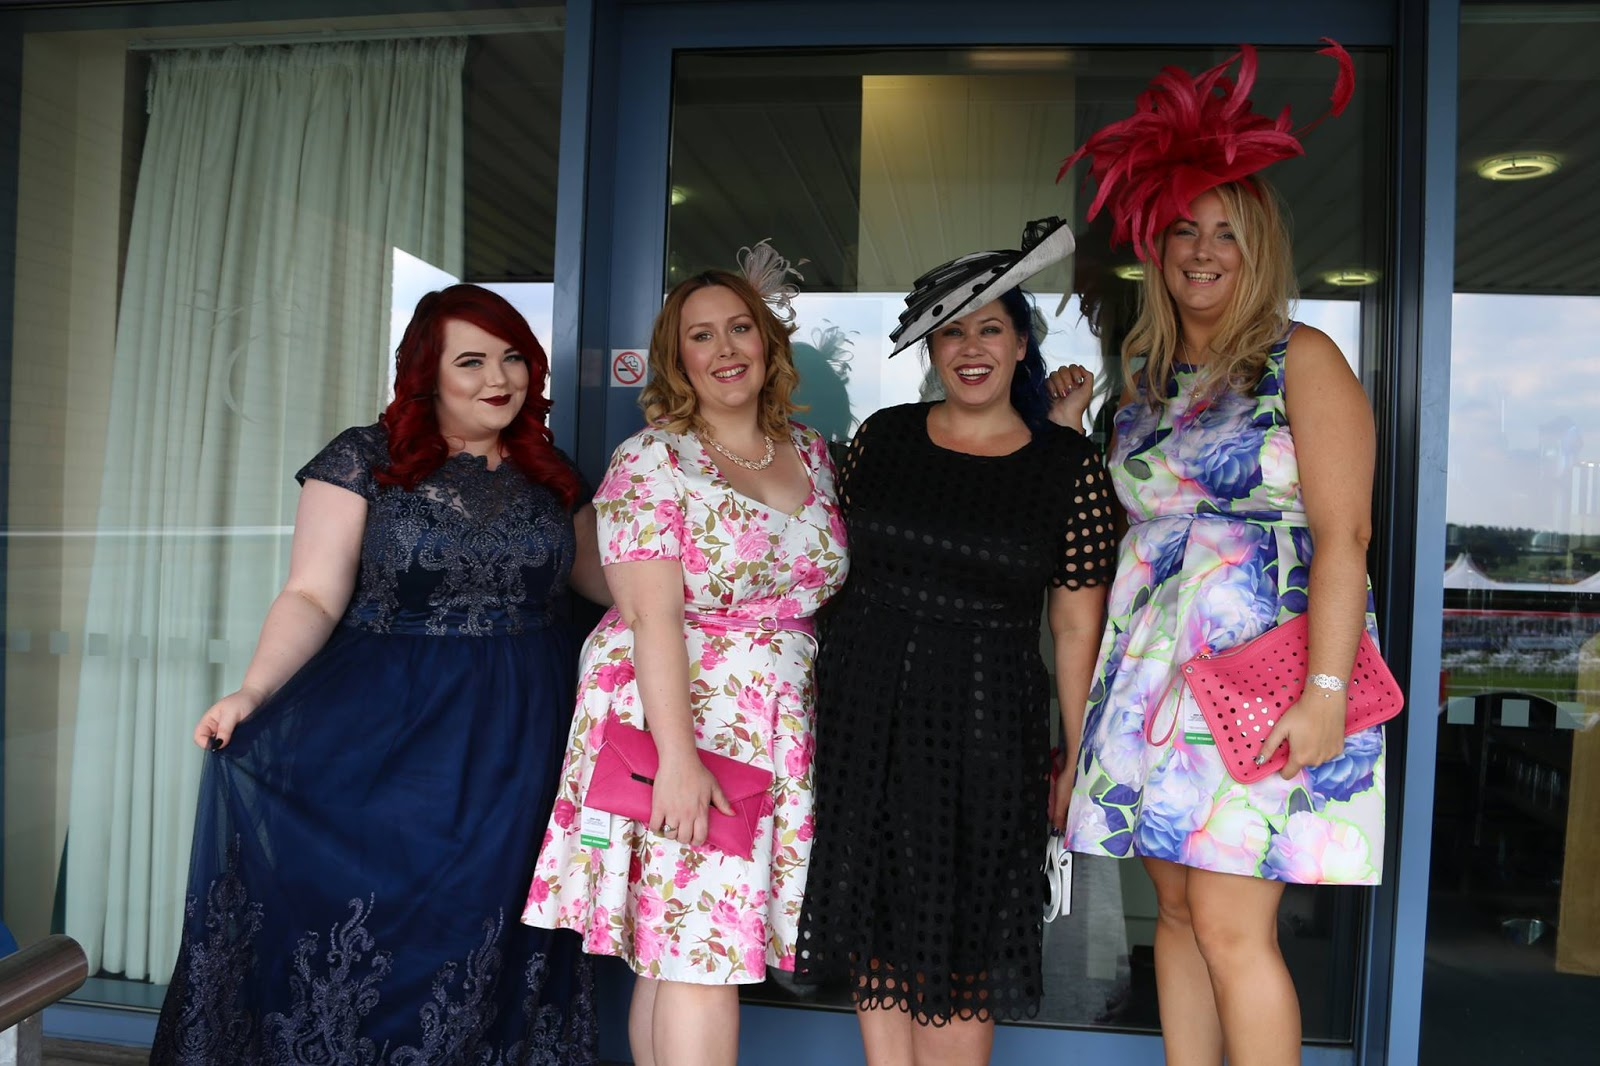 St Ledger's Ladies Day at Doncaster Races